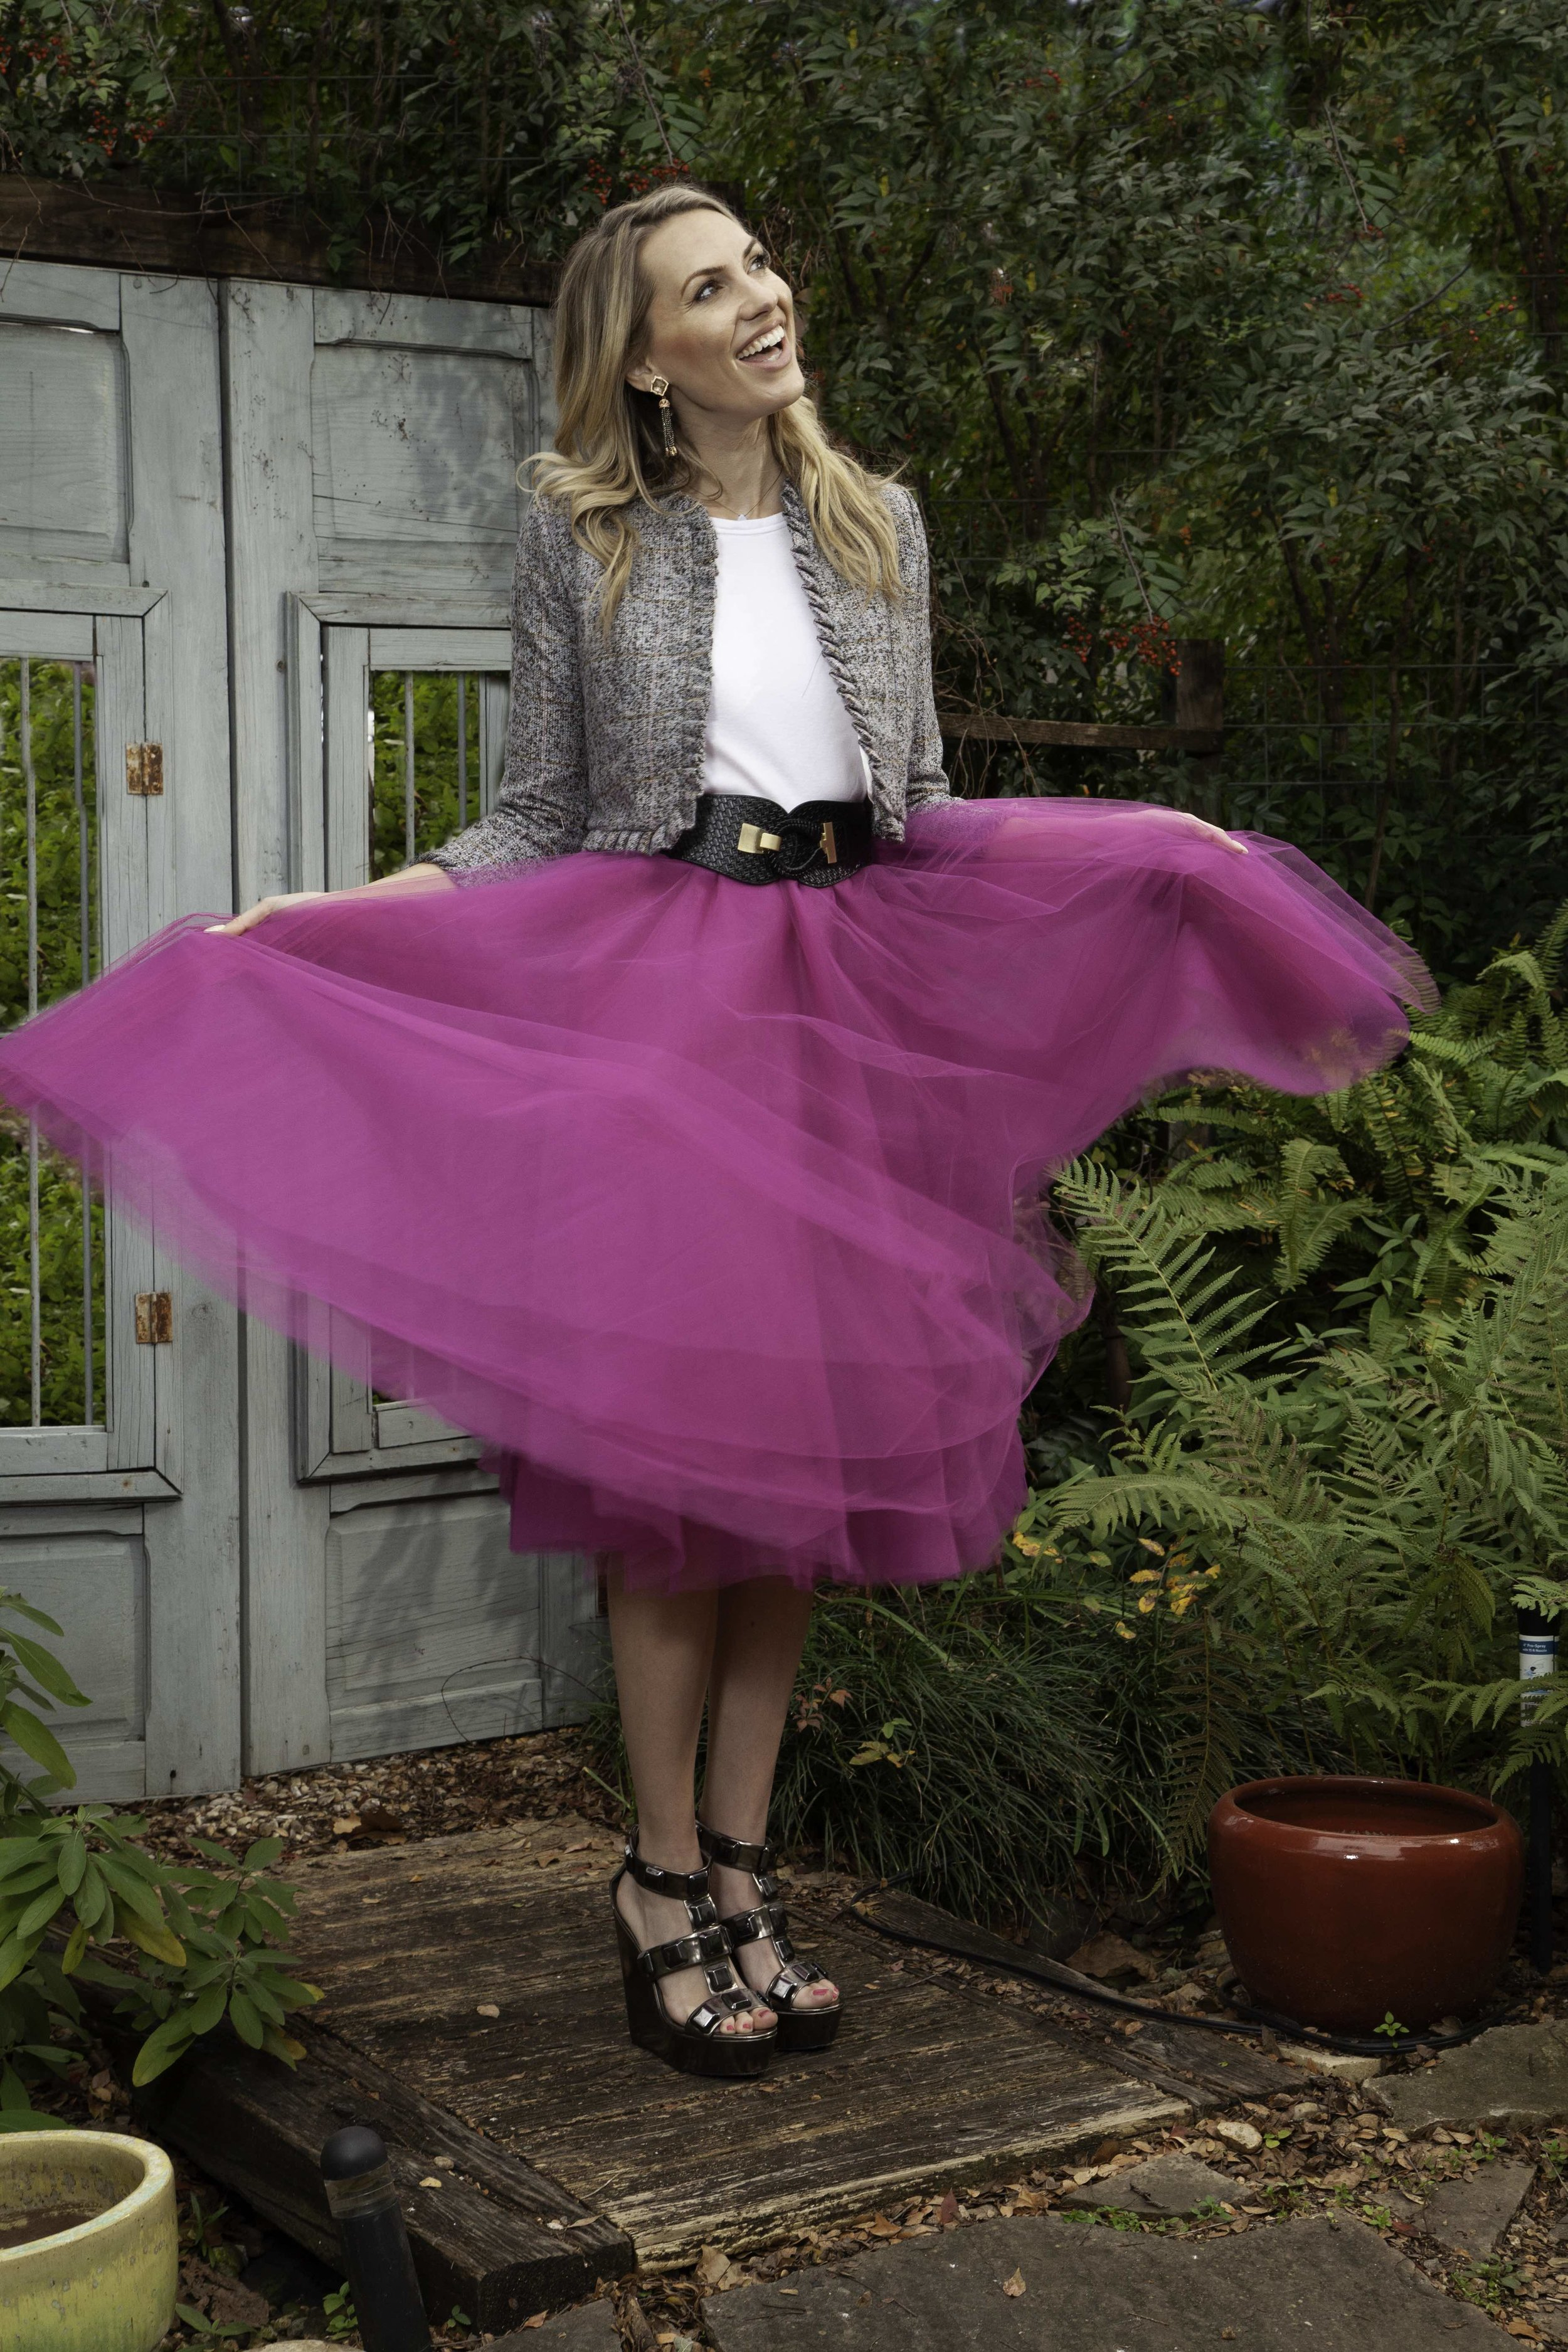 Zoe Baker Pink Skirt and Jacket.jpg